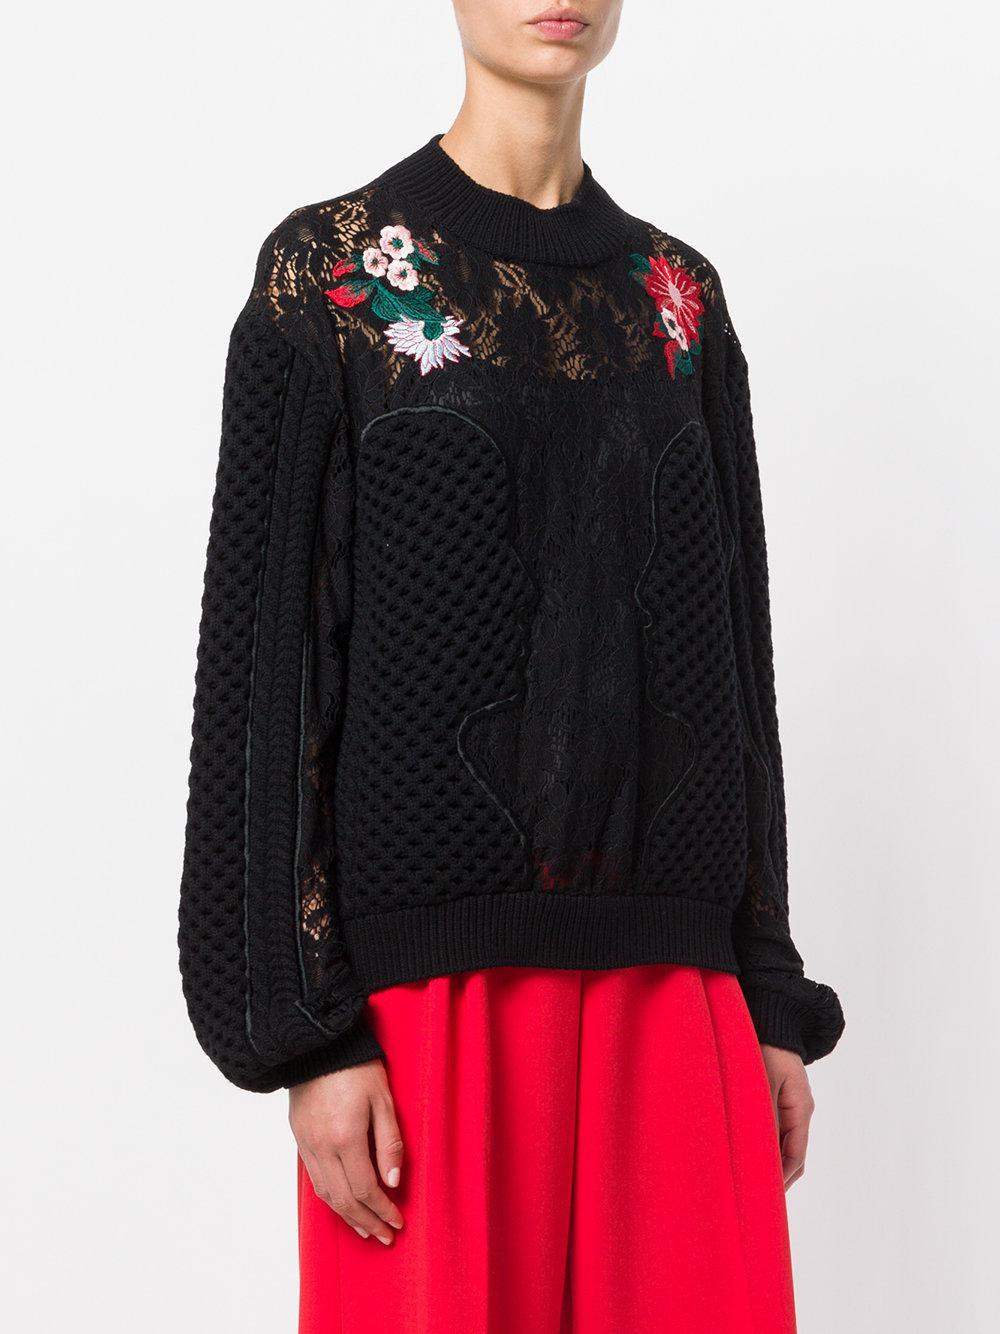 Vivetta embroidered lace jumper Sale Huge Surprise 769nlp018G